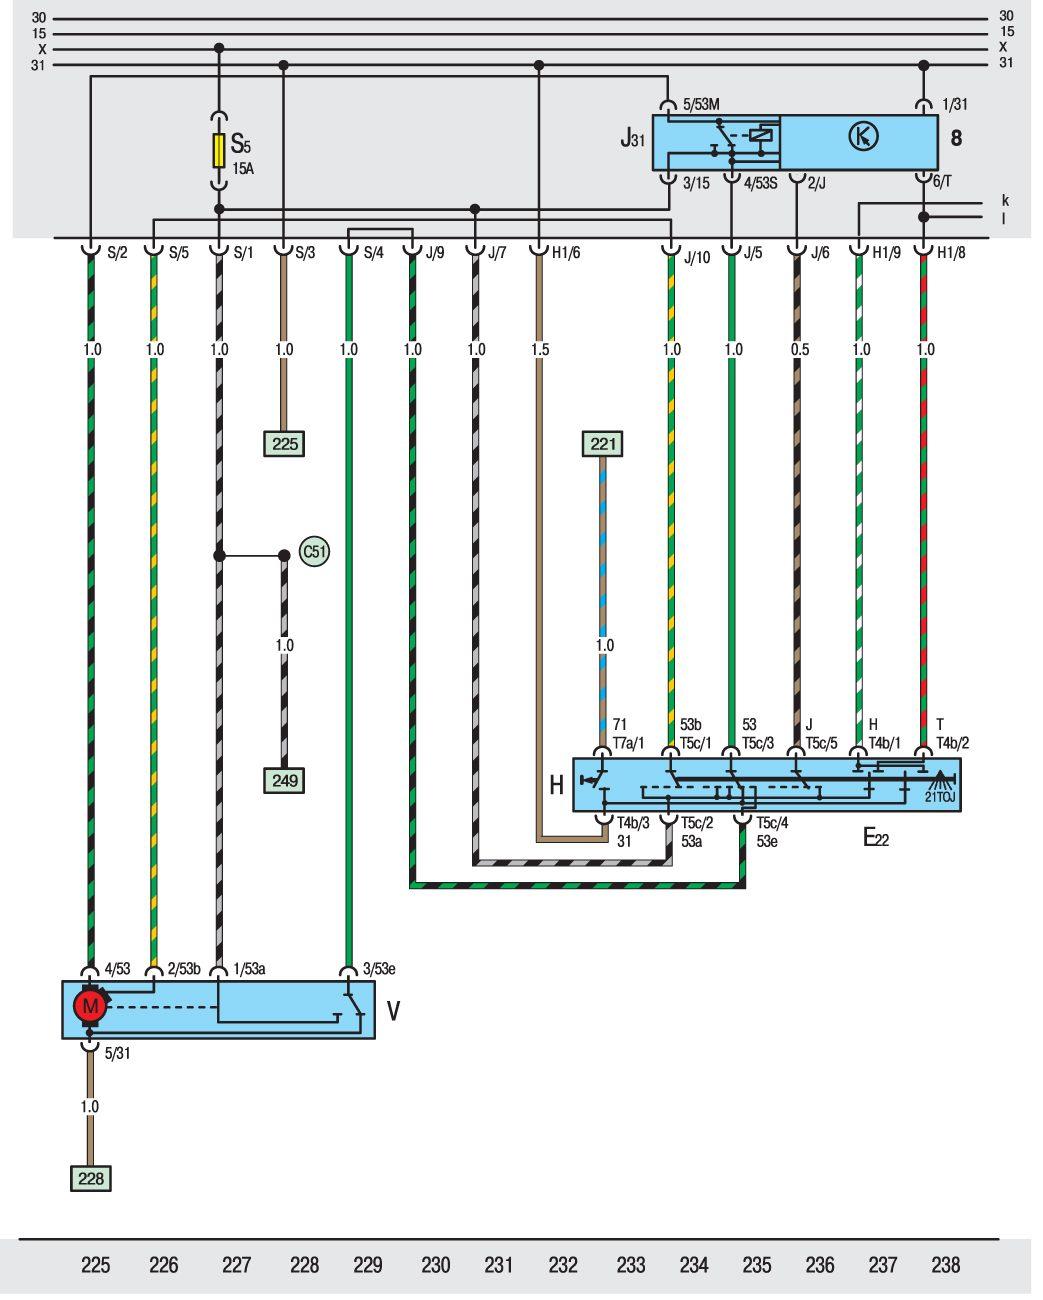 Схема автомобиля Фольксваген Транспортёр.